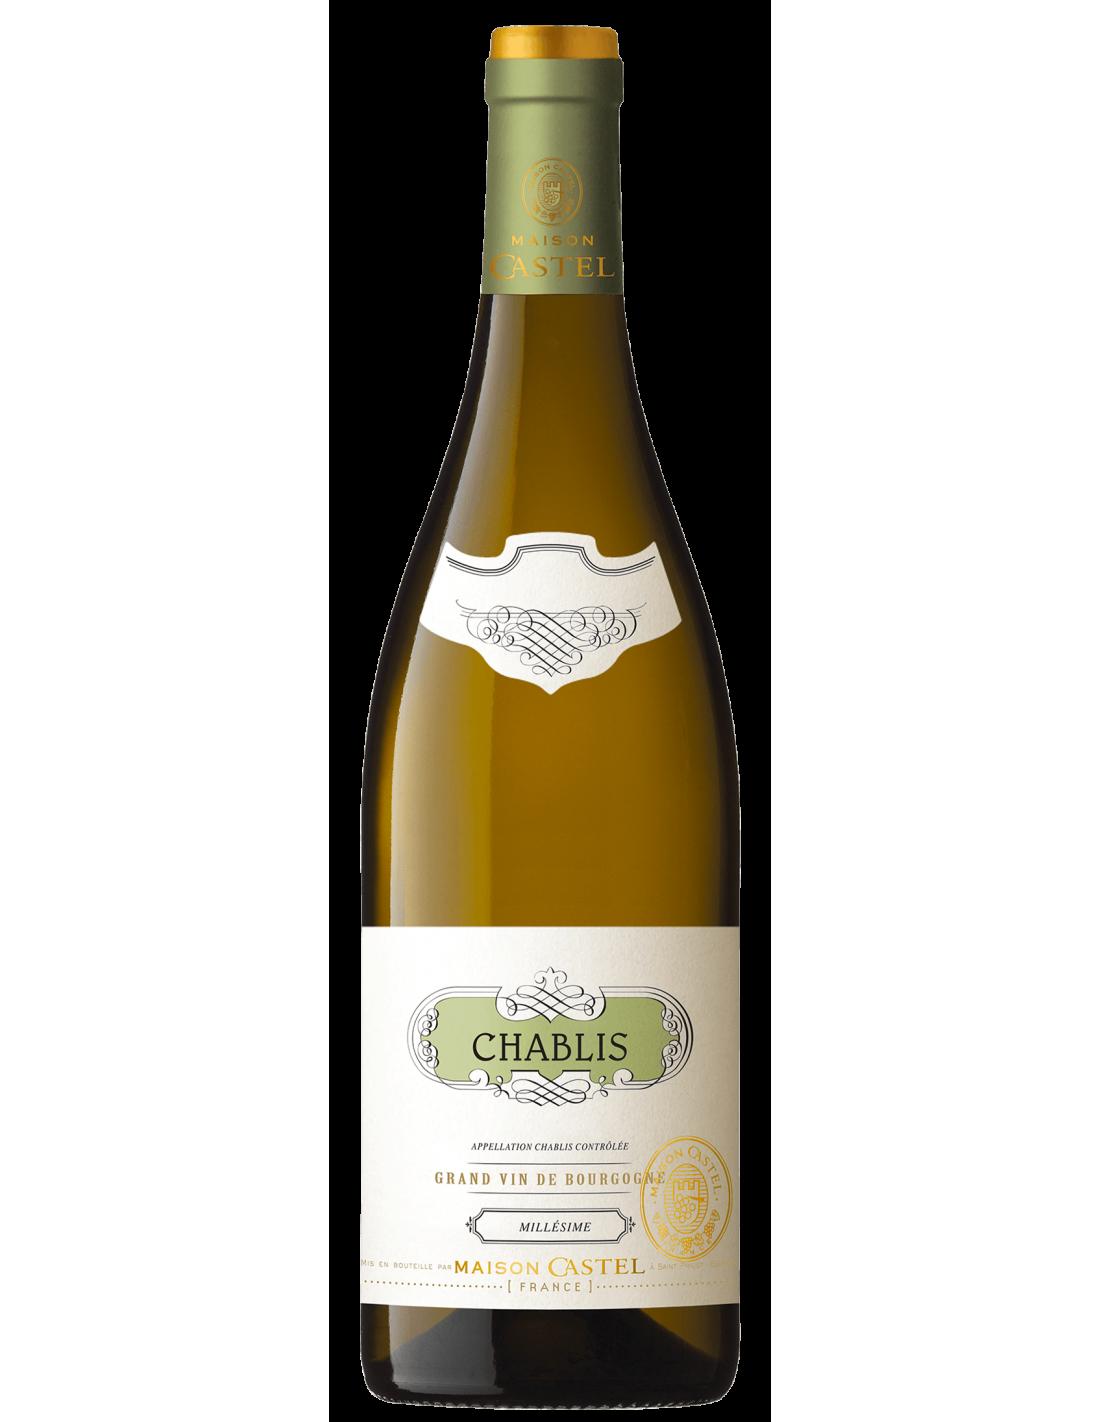 Vin alb, Maison Castel Chablis, 12.5% alc., 0.75L, Franta